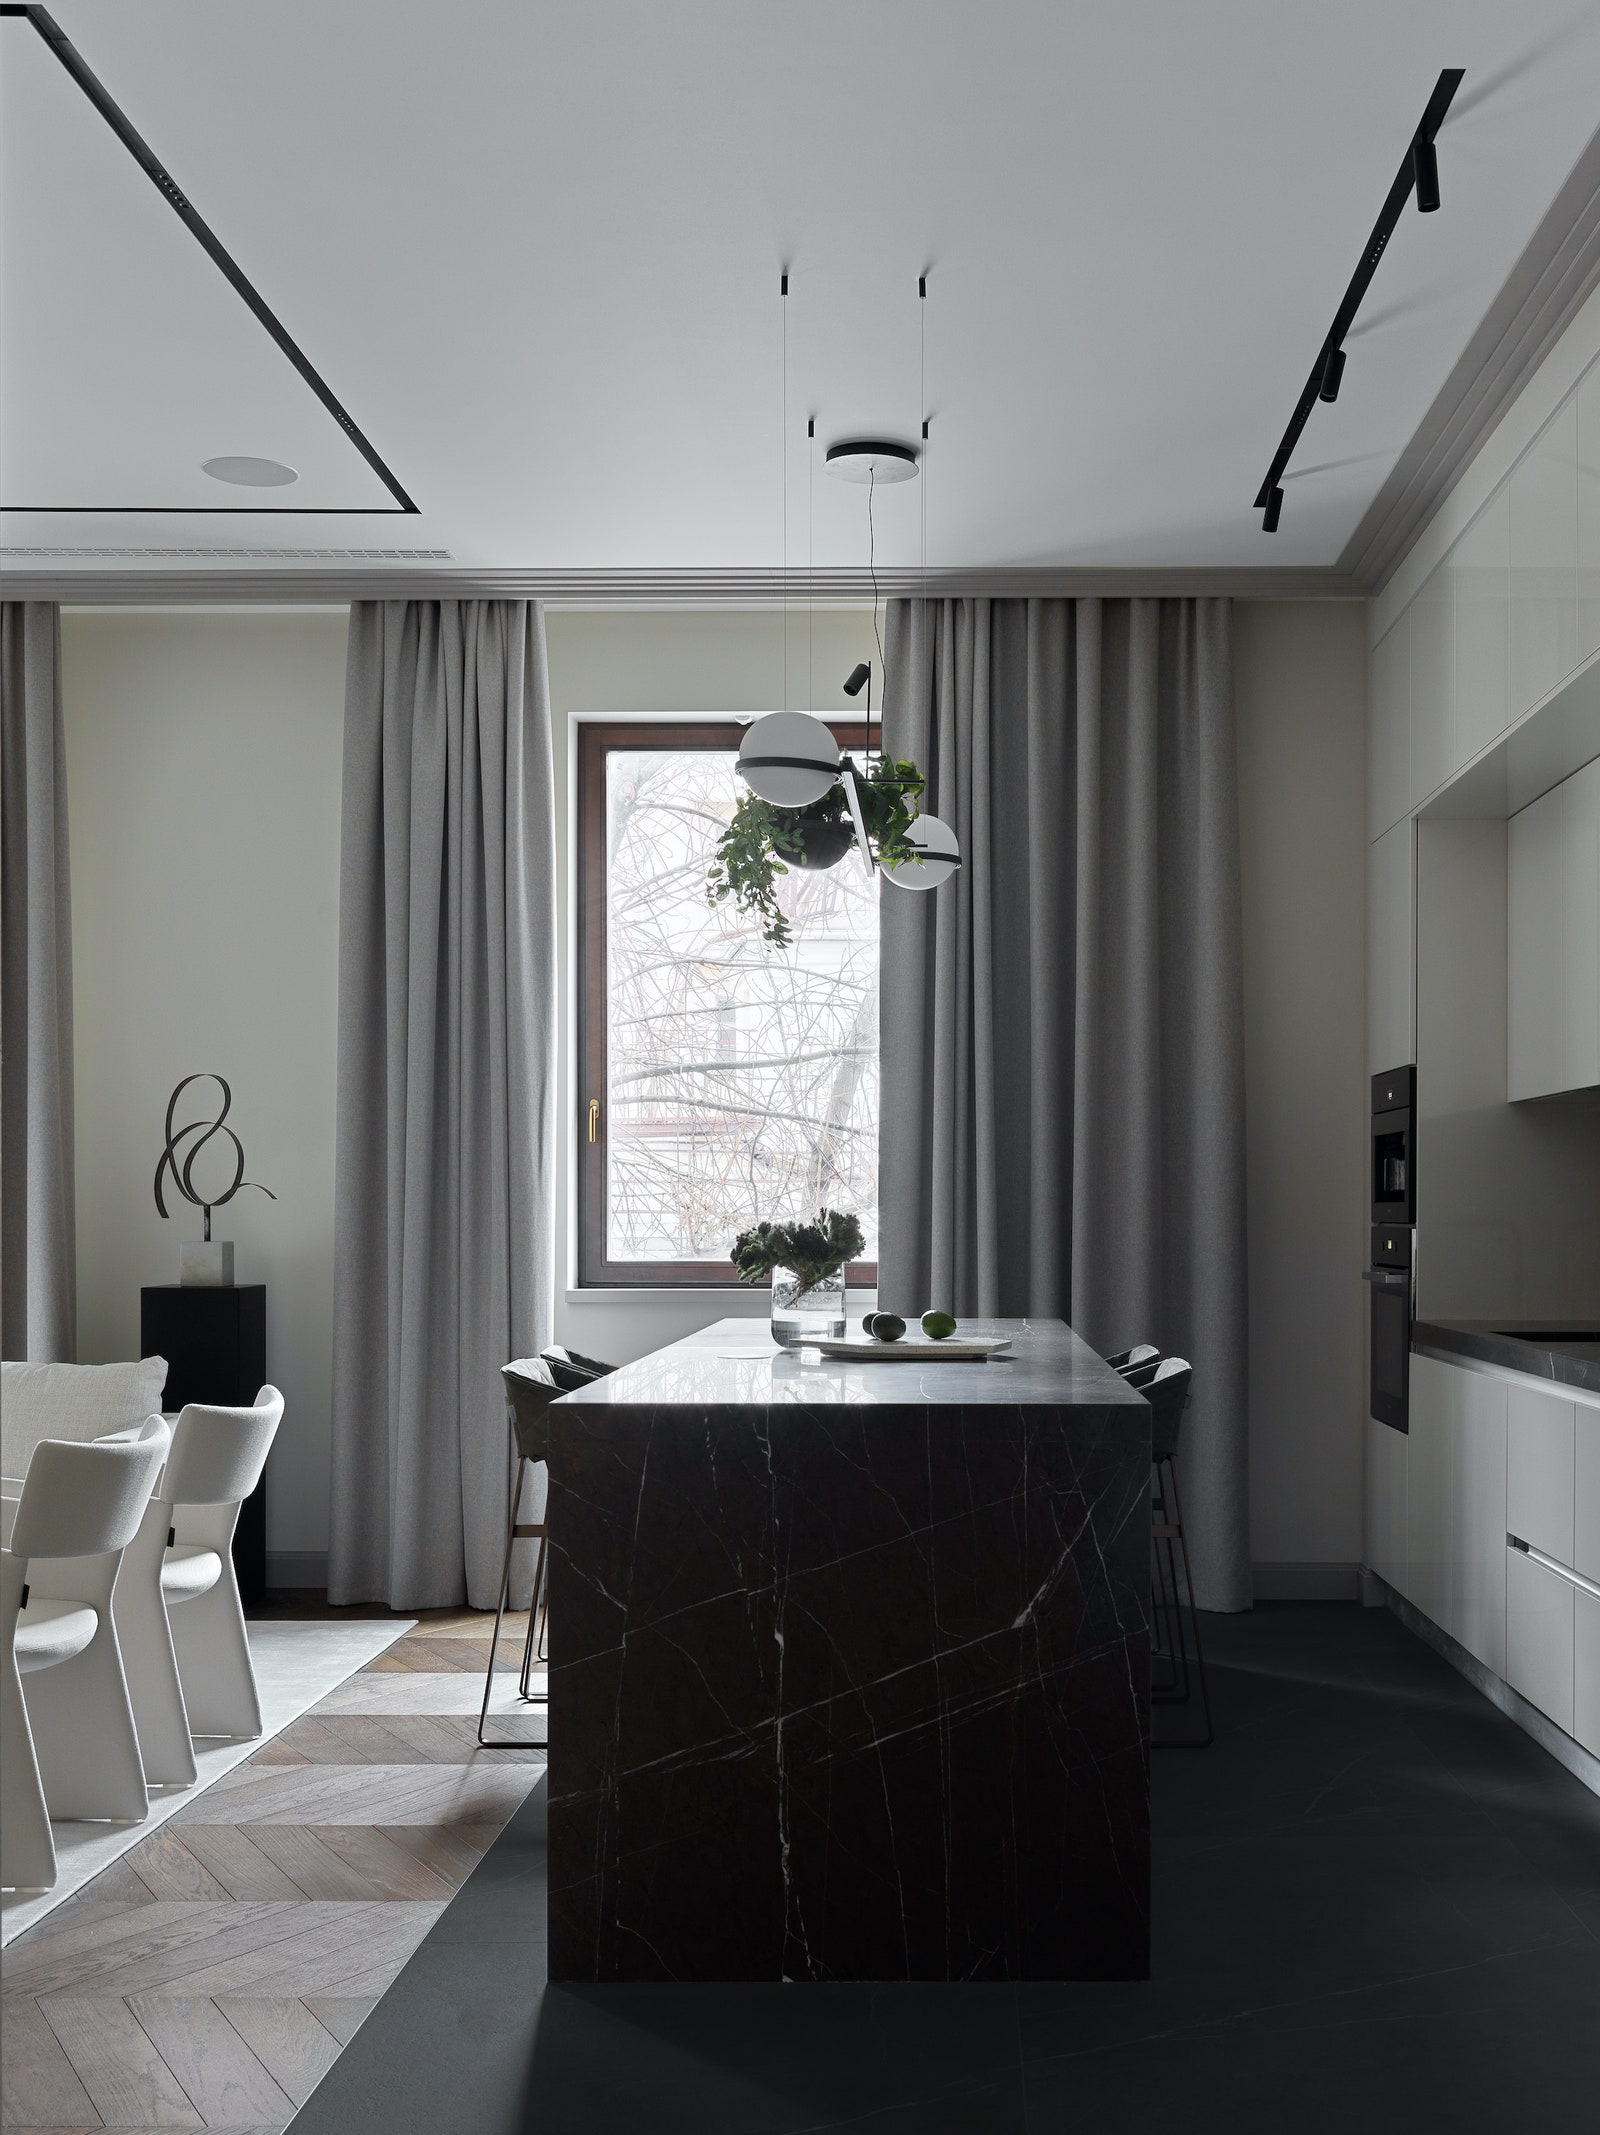 .  Treo   Piet Boon  Vibia  Carpetlinq     GK Concept  Moonstores  JAB Fabrics       Dennebos Flooring  Archskin.